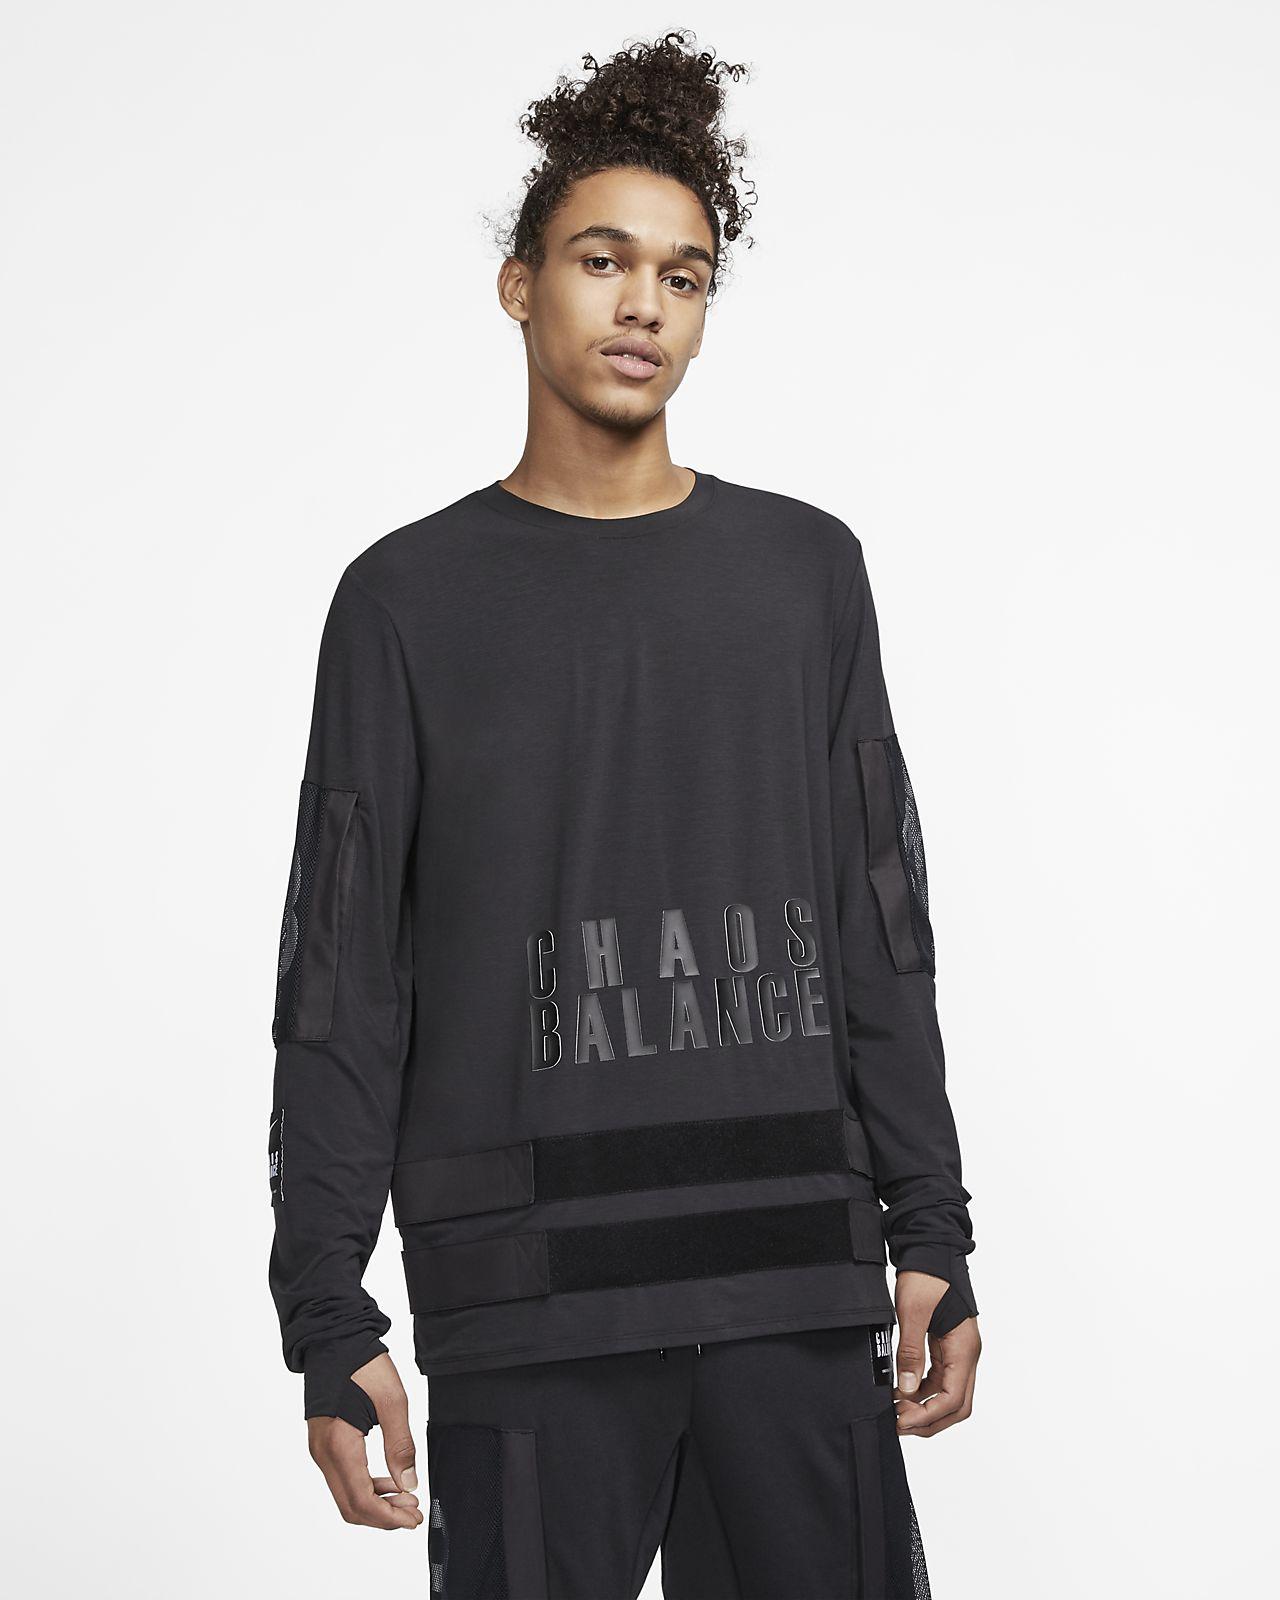 Nike x Undercover Men's Long-Sleeve Top